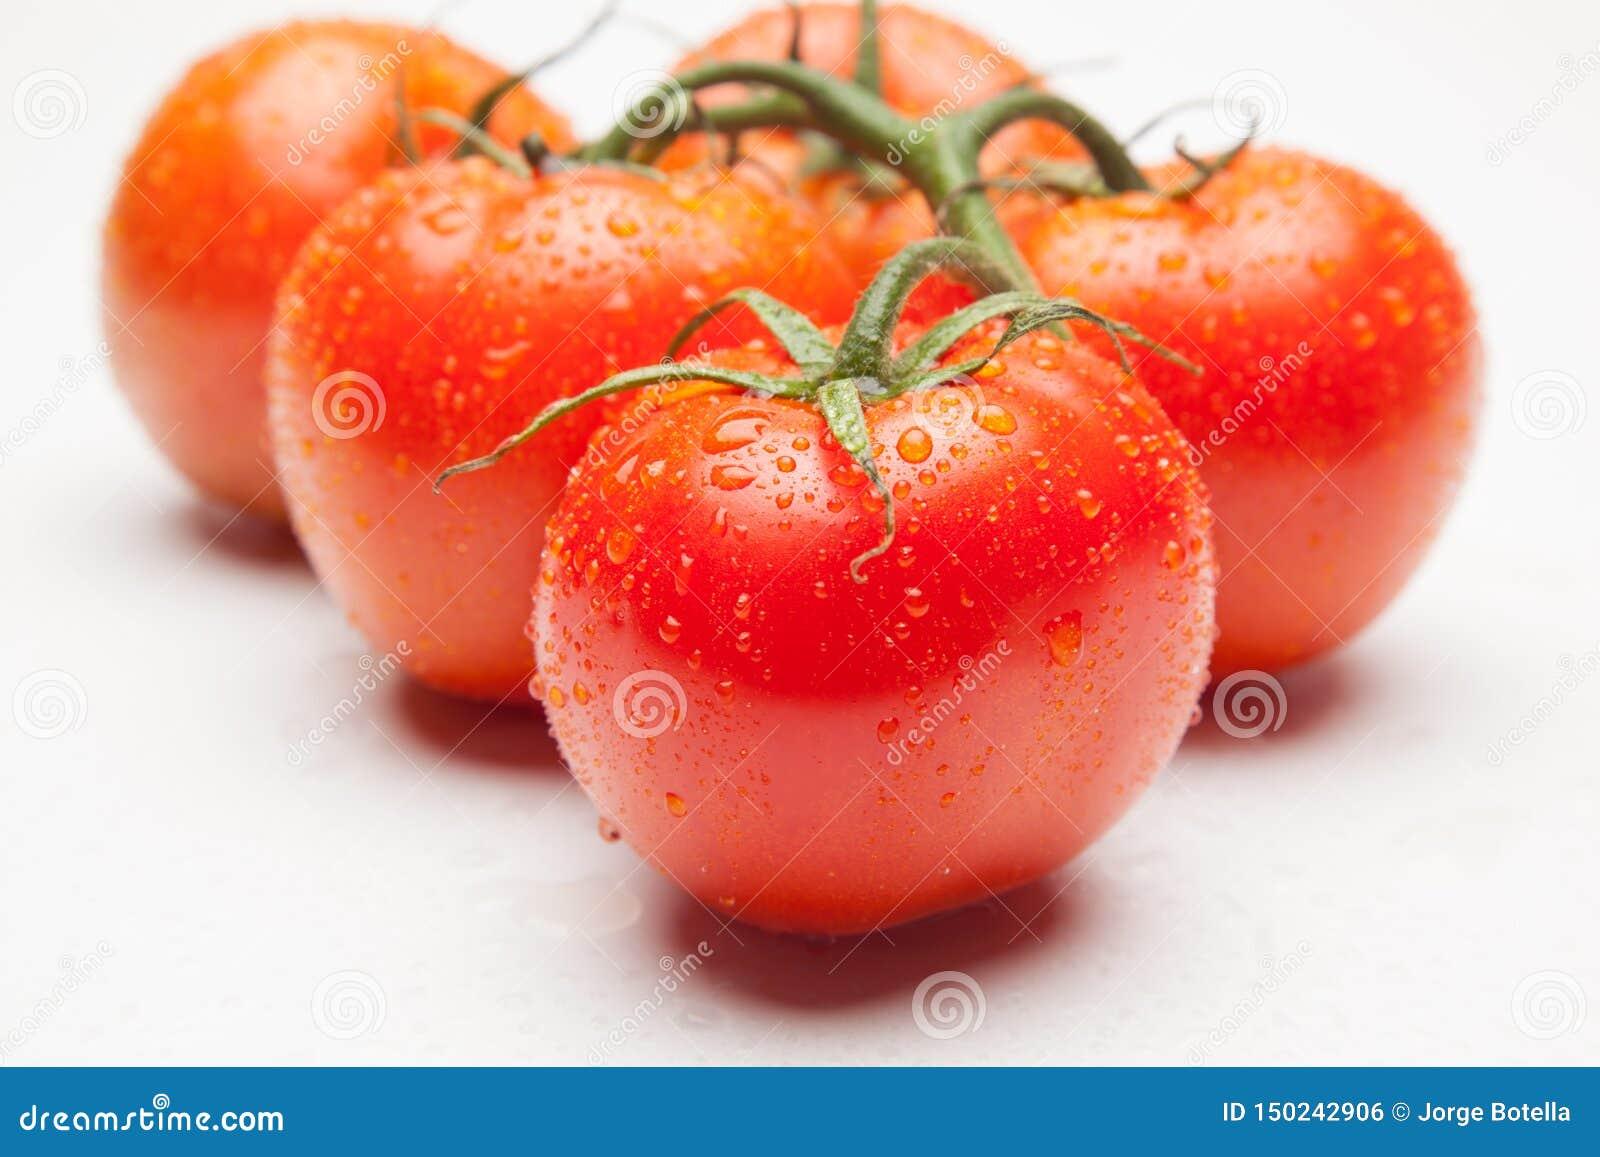 Tomate rojo, con descensos del agua que denota frescura y salud